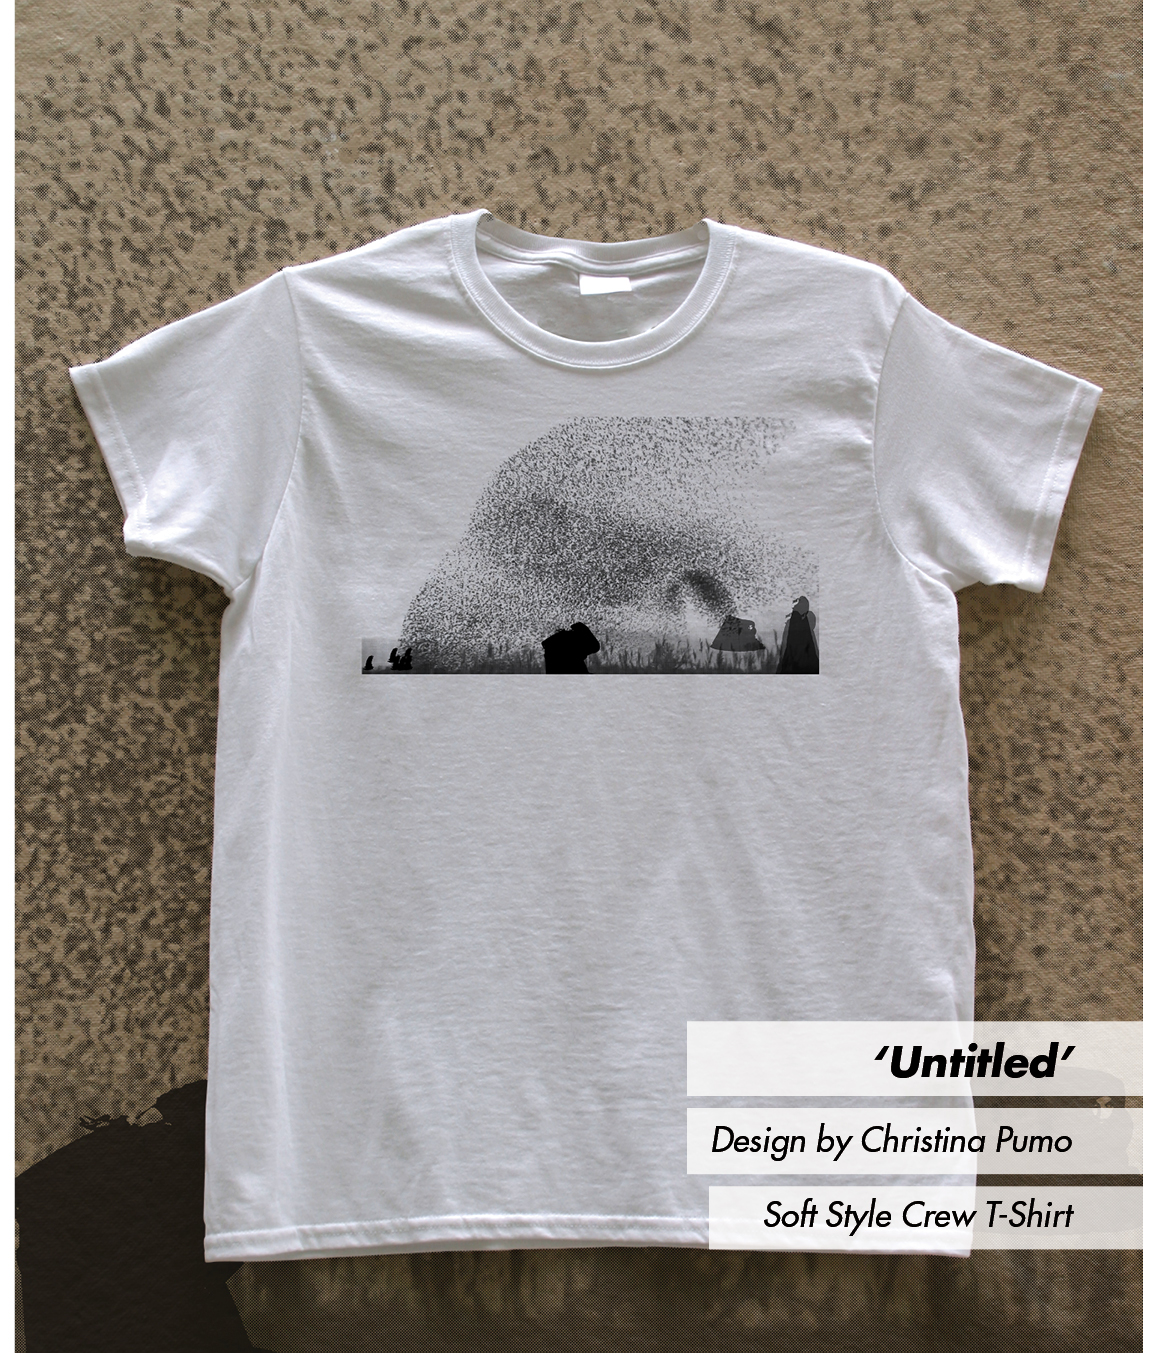 d62bc0ab9b8 Gildan Shirt Colors 2014